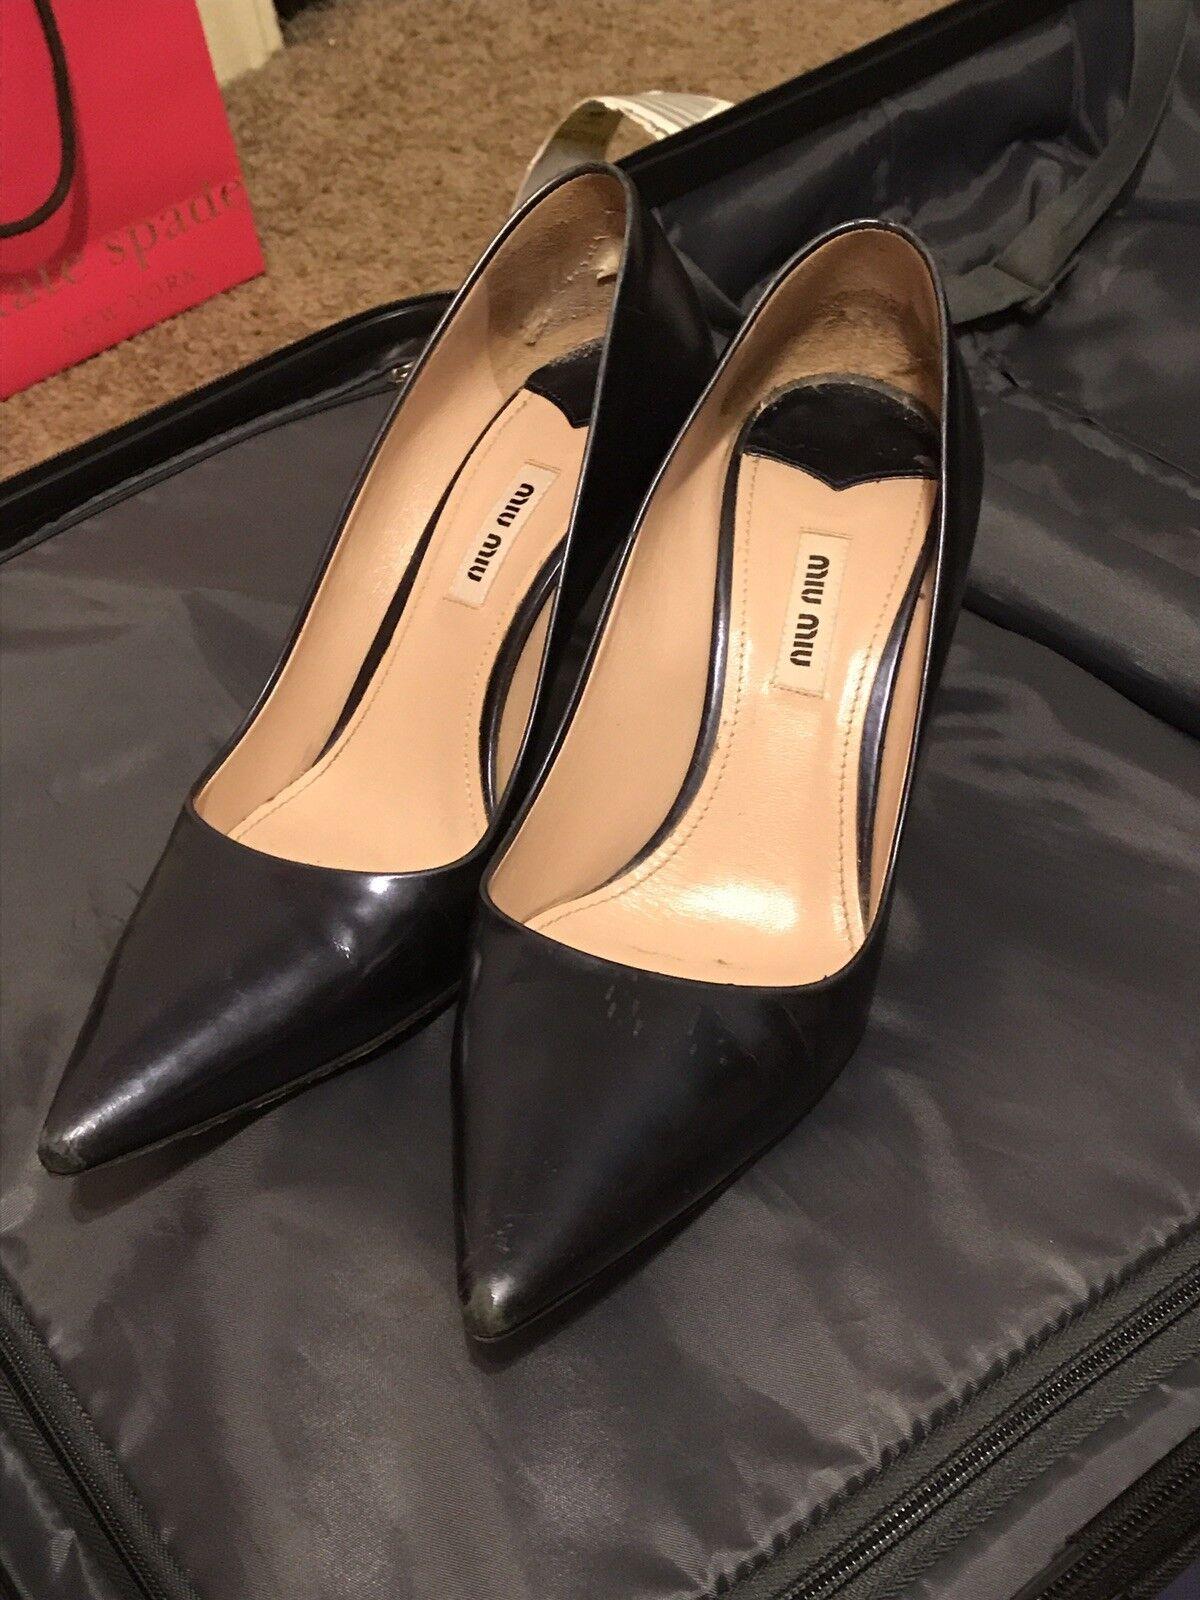 Miu Miu Heels, Midnight color, Size 39